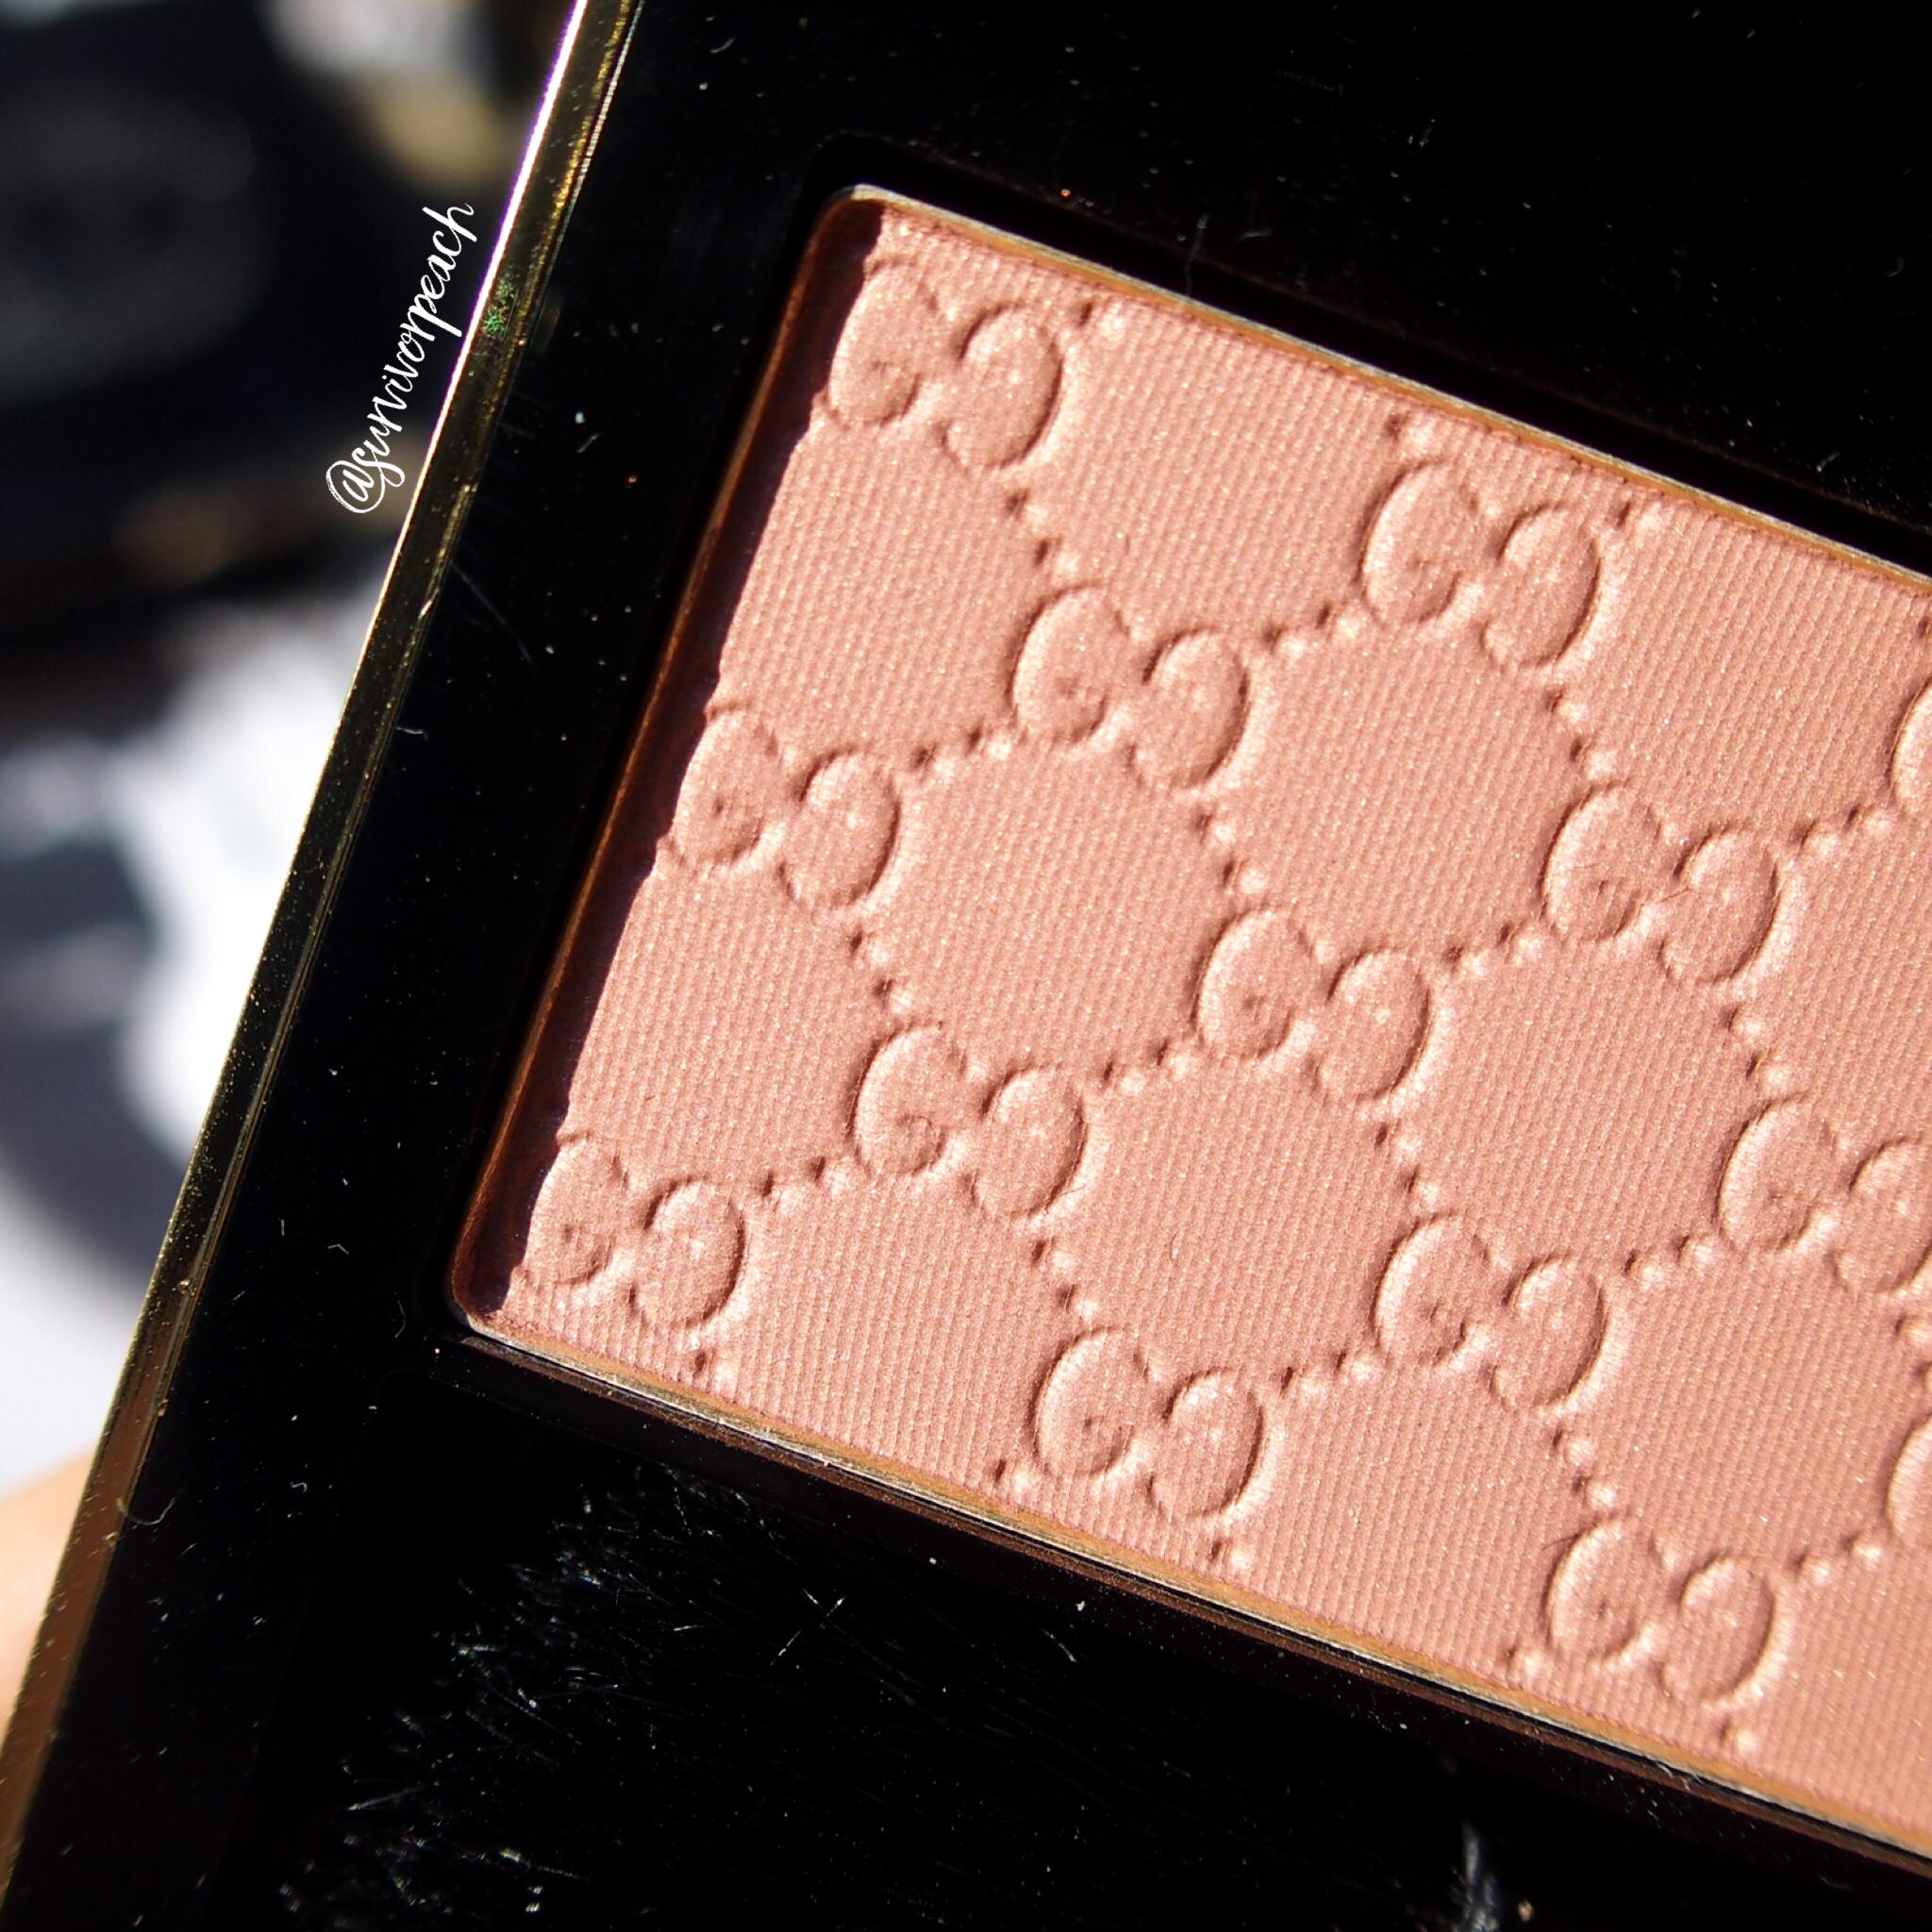 Gucci Beauty Sheer Blushing Powder in Spicy Petal